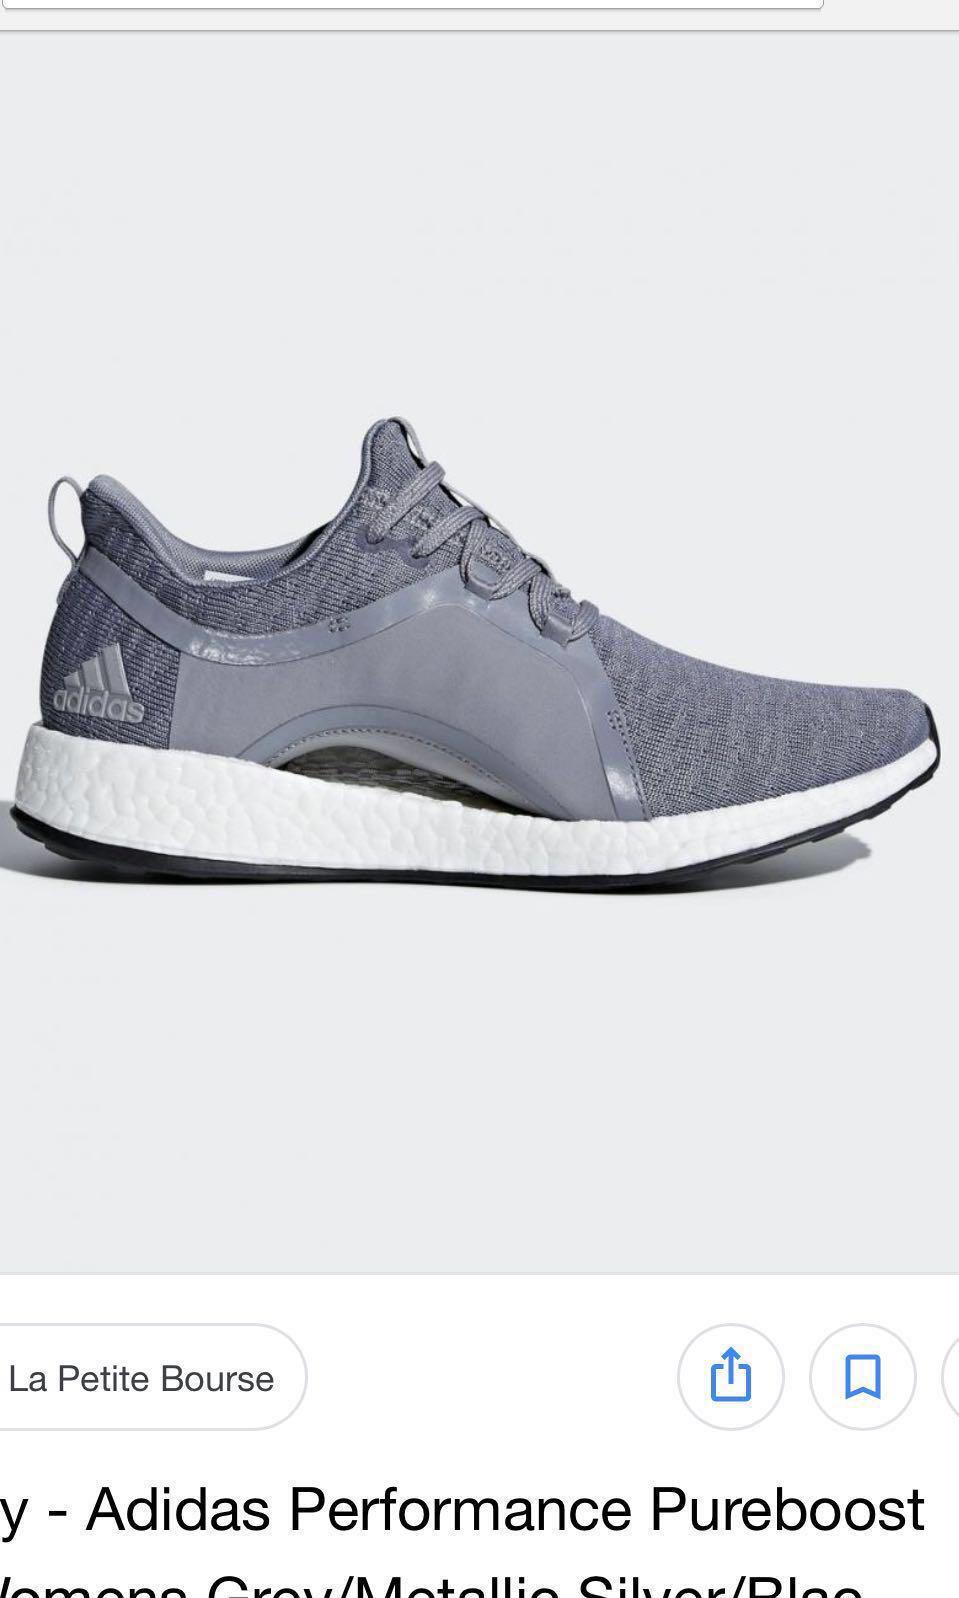 Adidas pureboost x women's pure boost